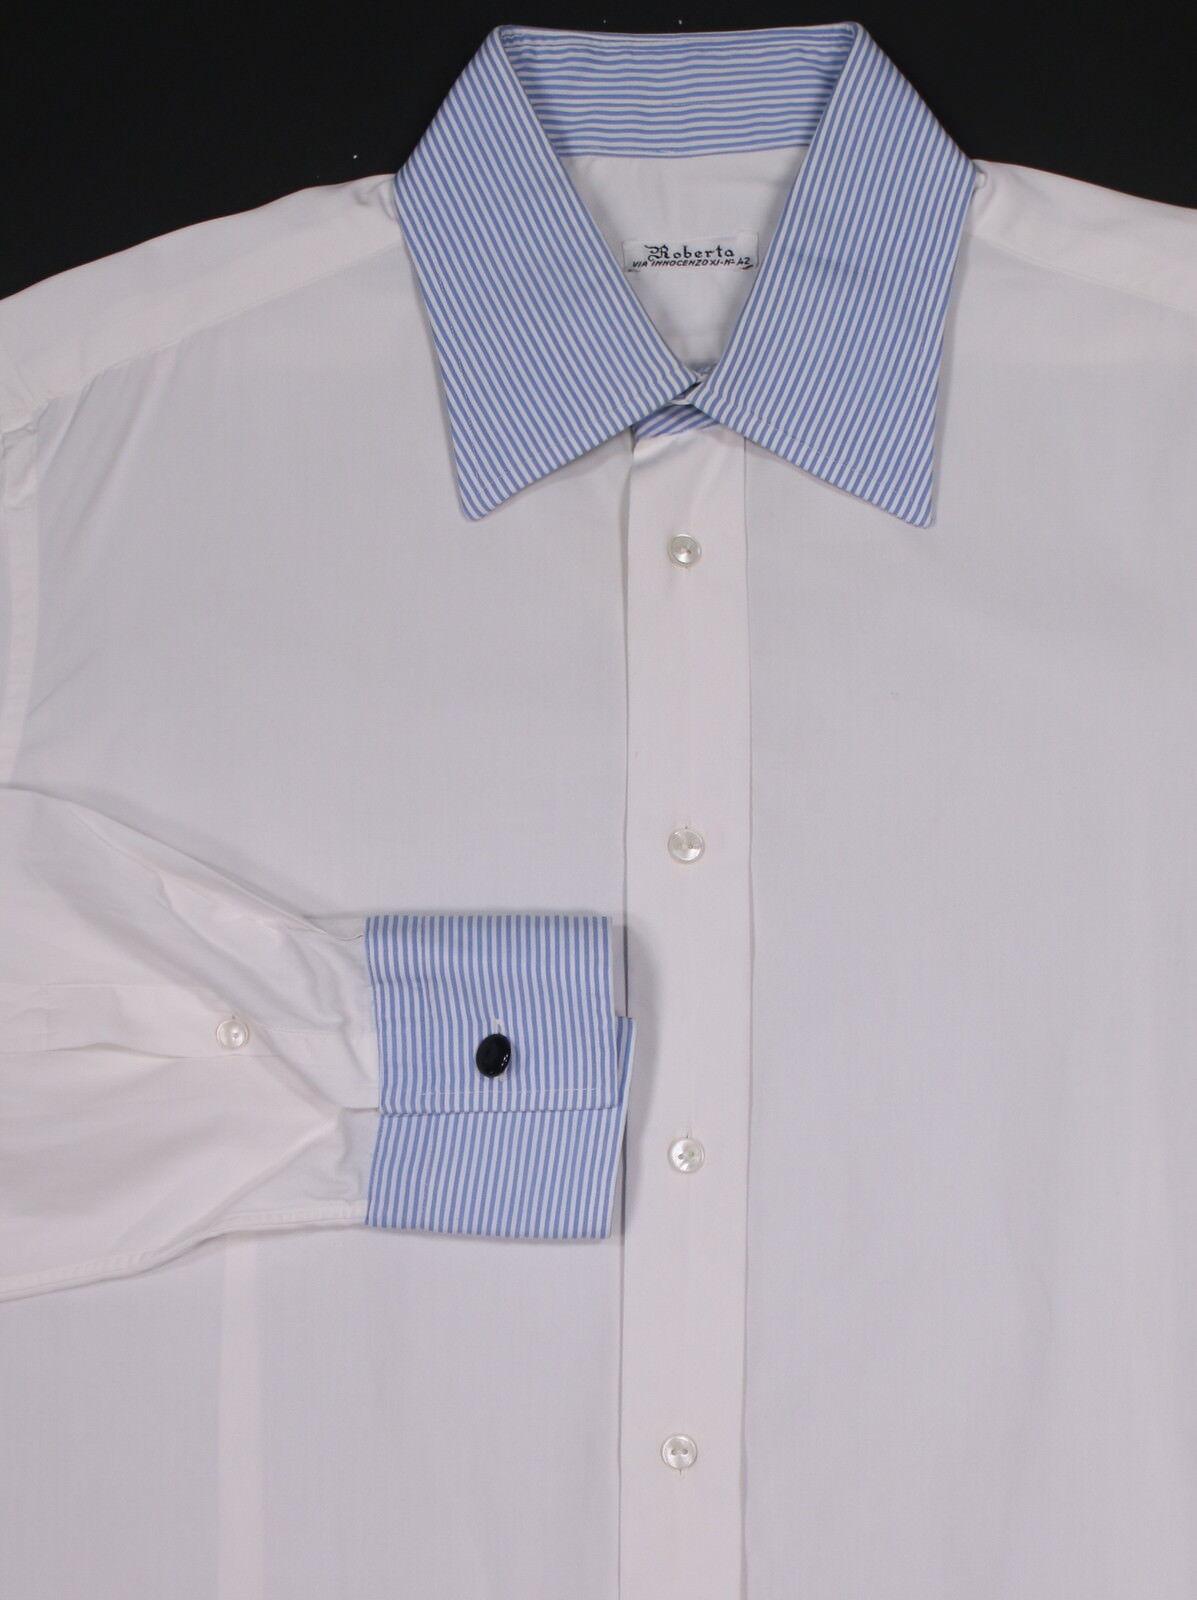 ROBERTO  Milano Bespoke Weiß w/ Blau Stripes Cuffs/Collar Dress Shirt 15-32